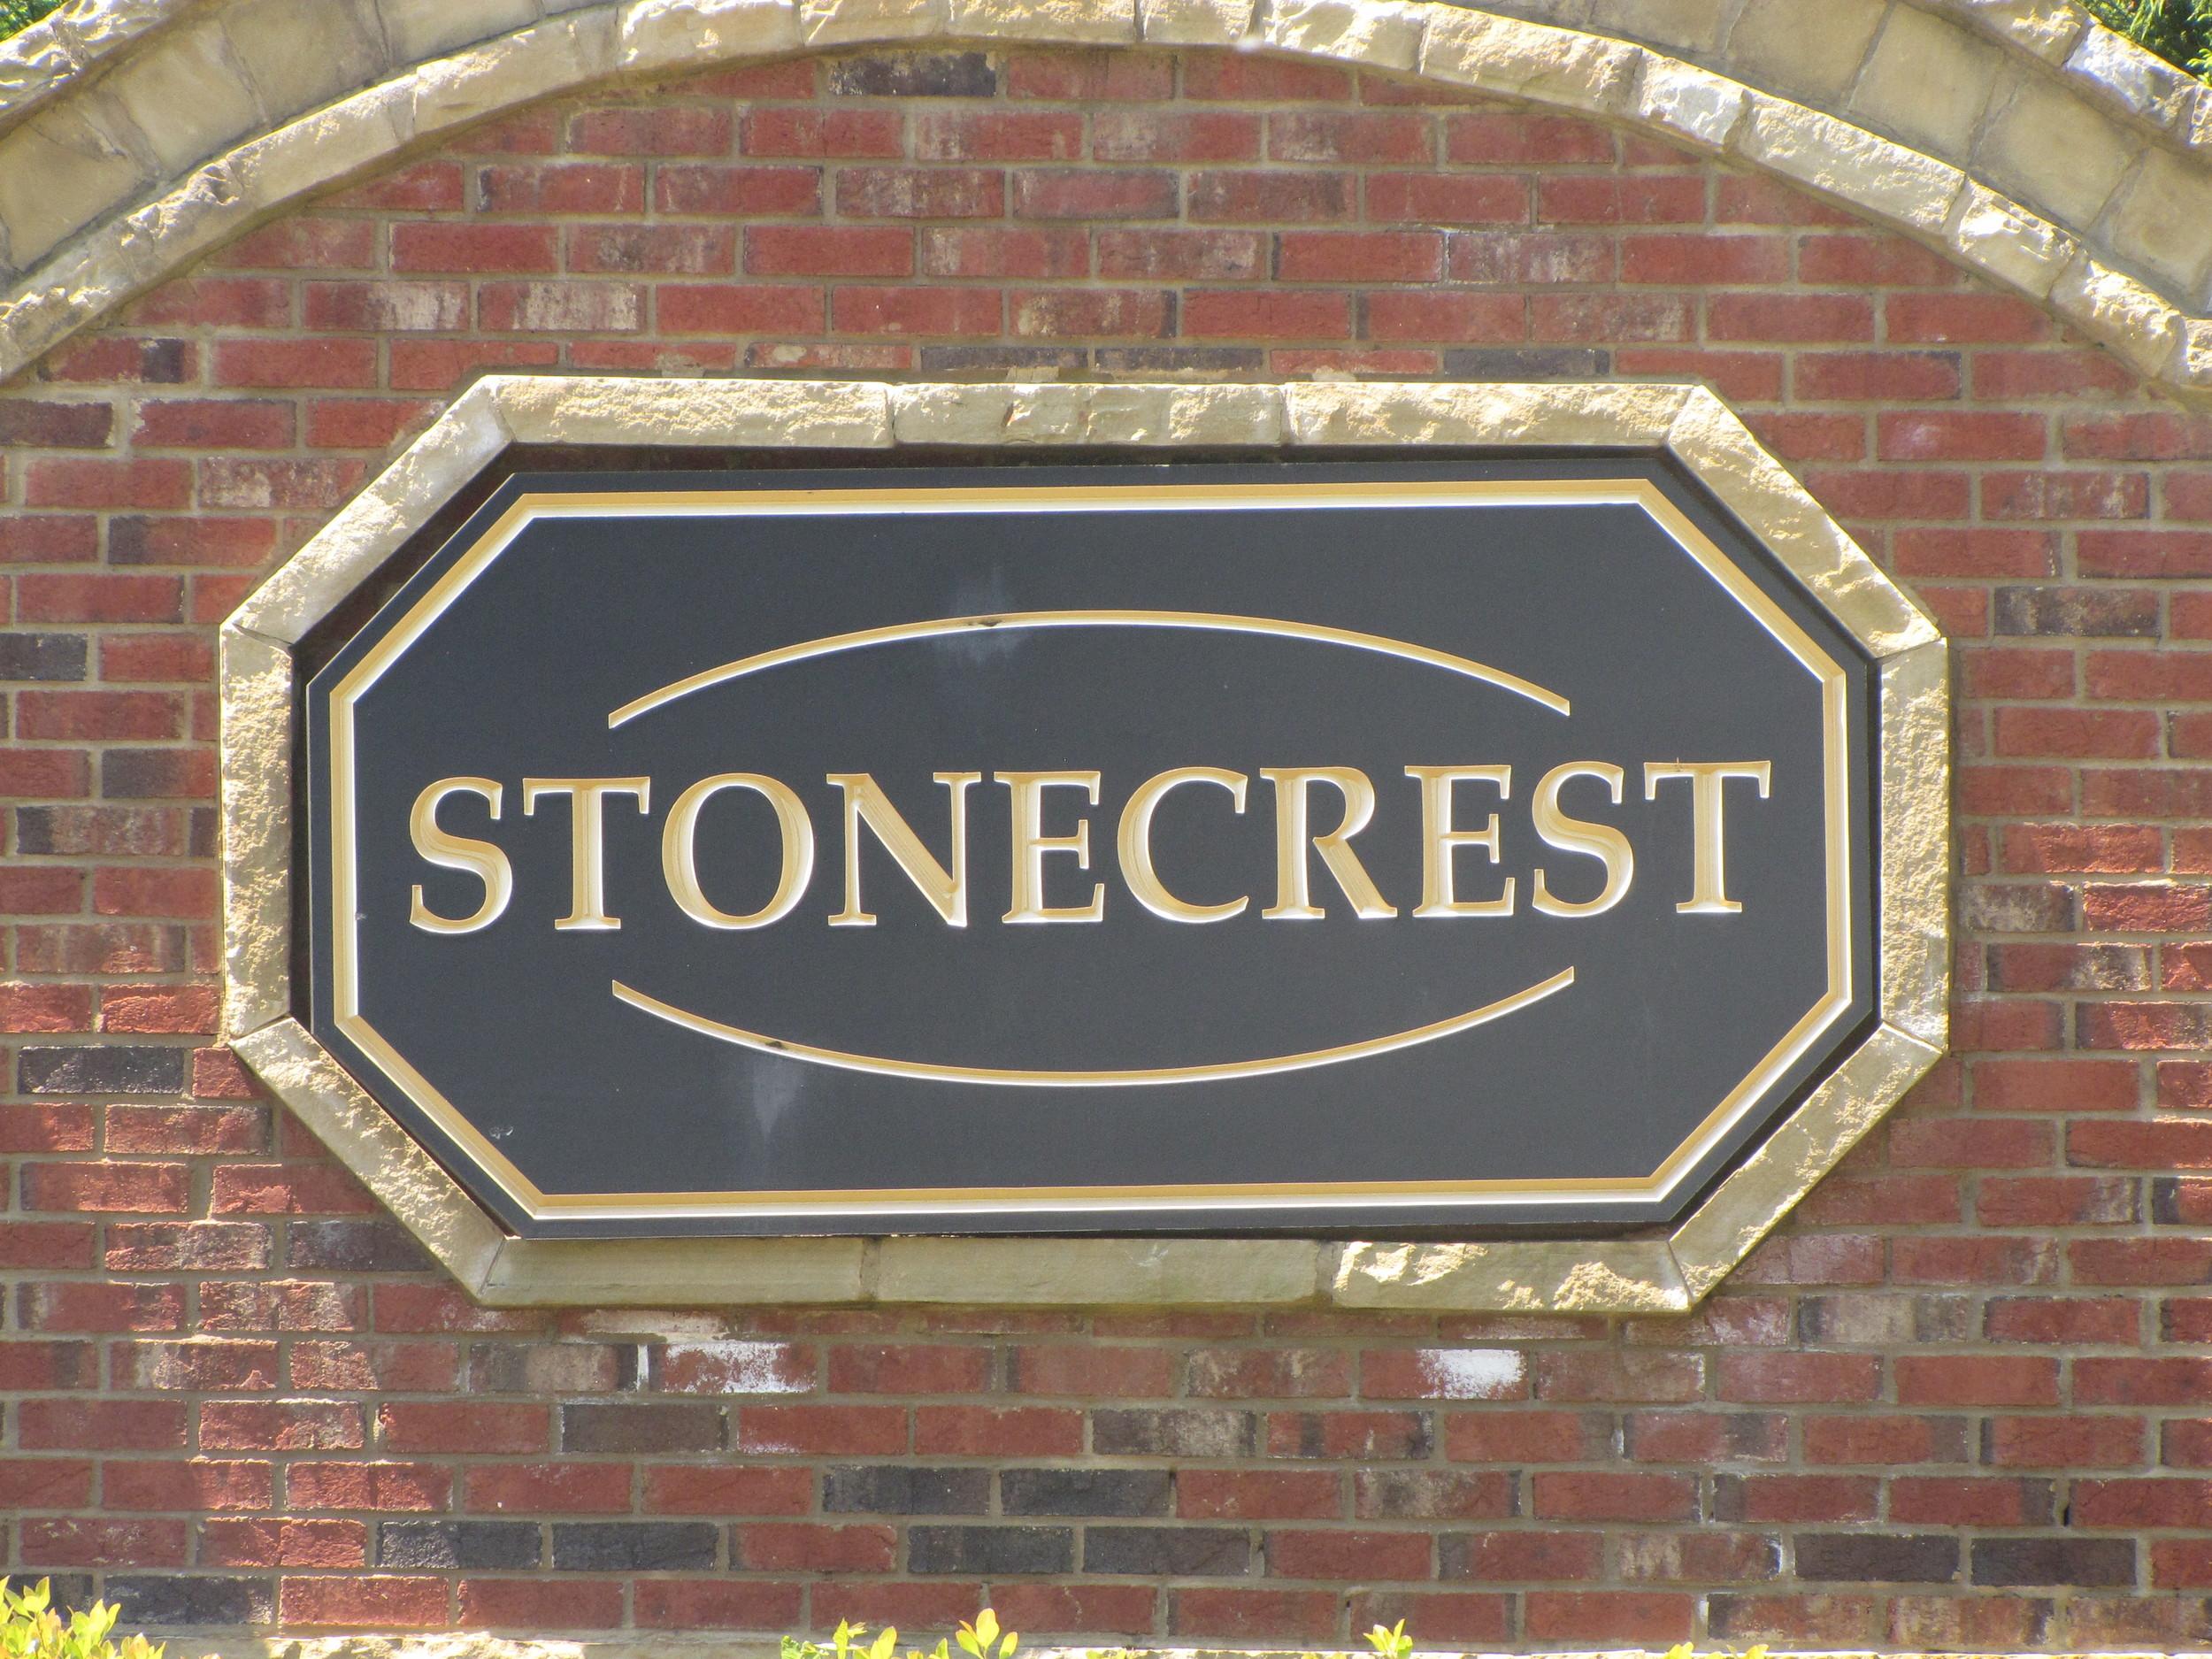 Stoncrest Neighborhood monument